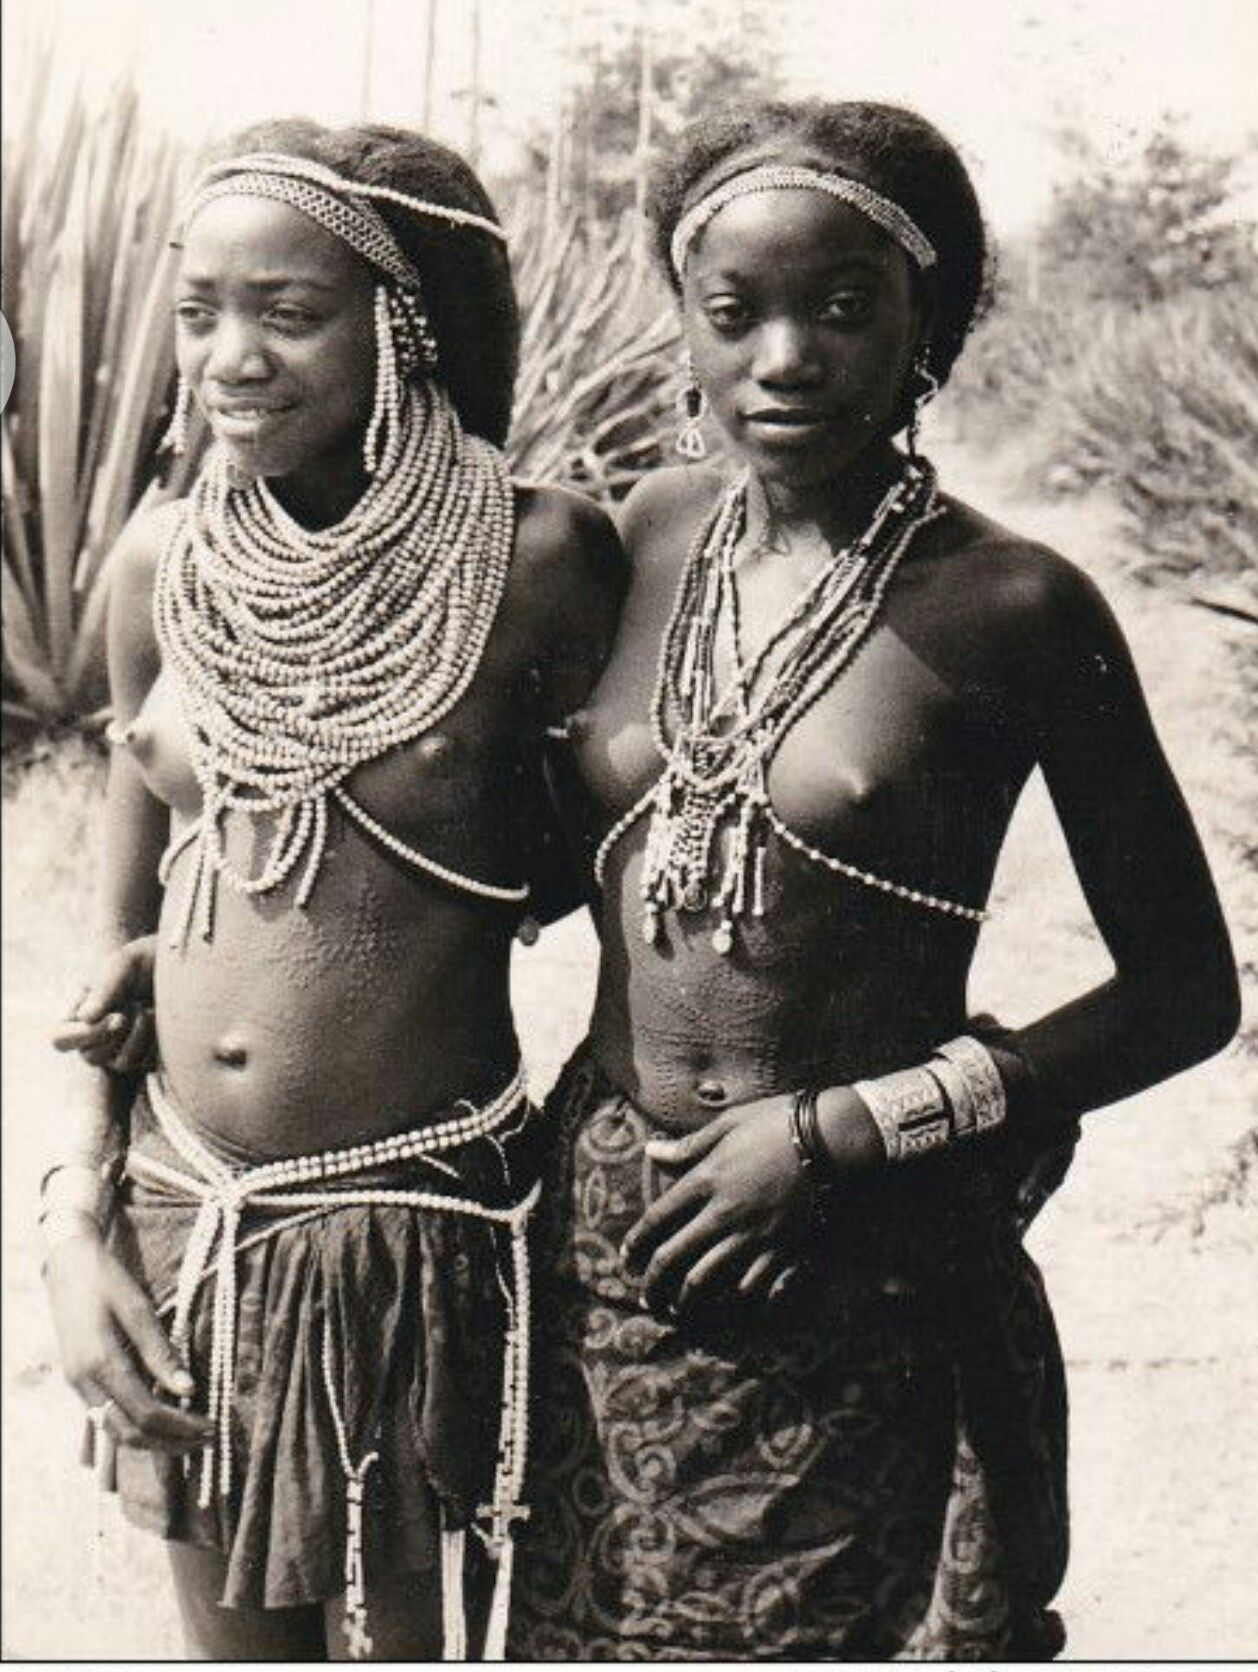 umbundu girls, angola 1920's | angola, luanda | native girls